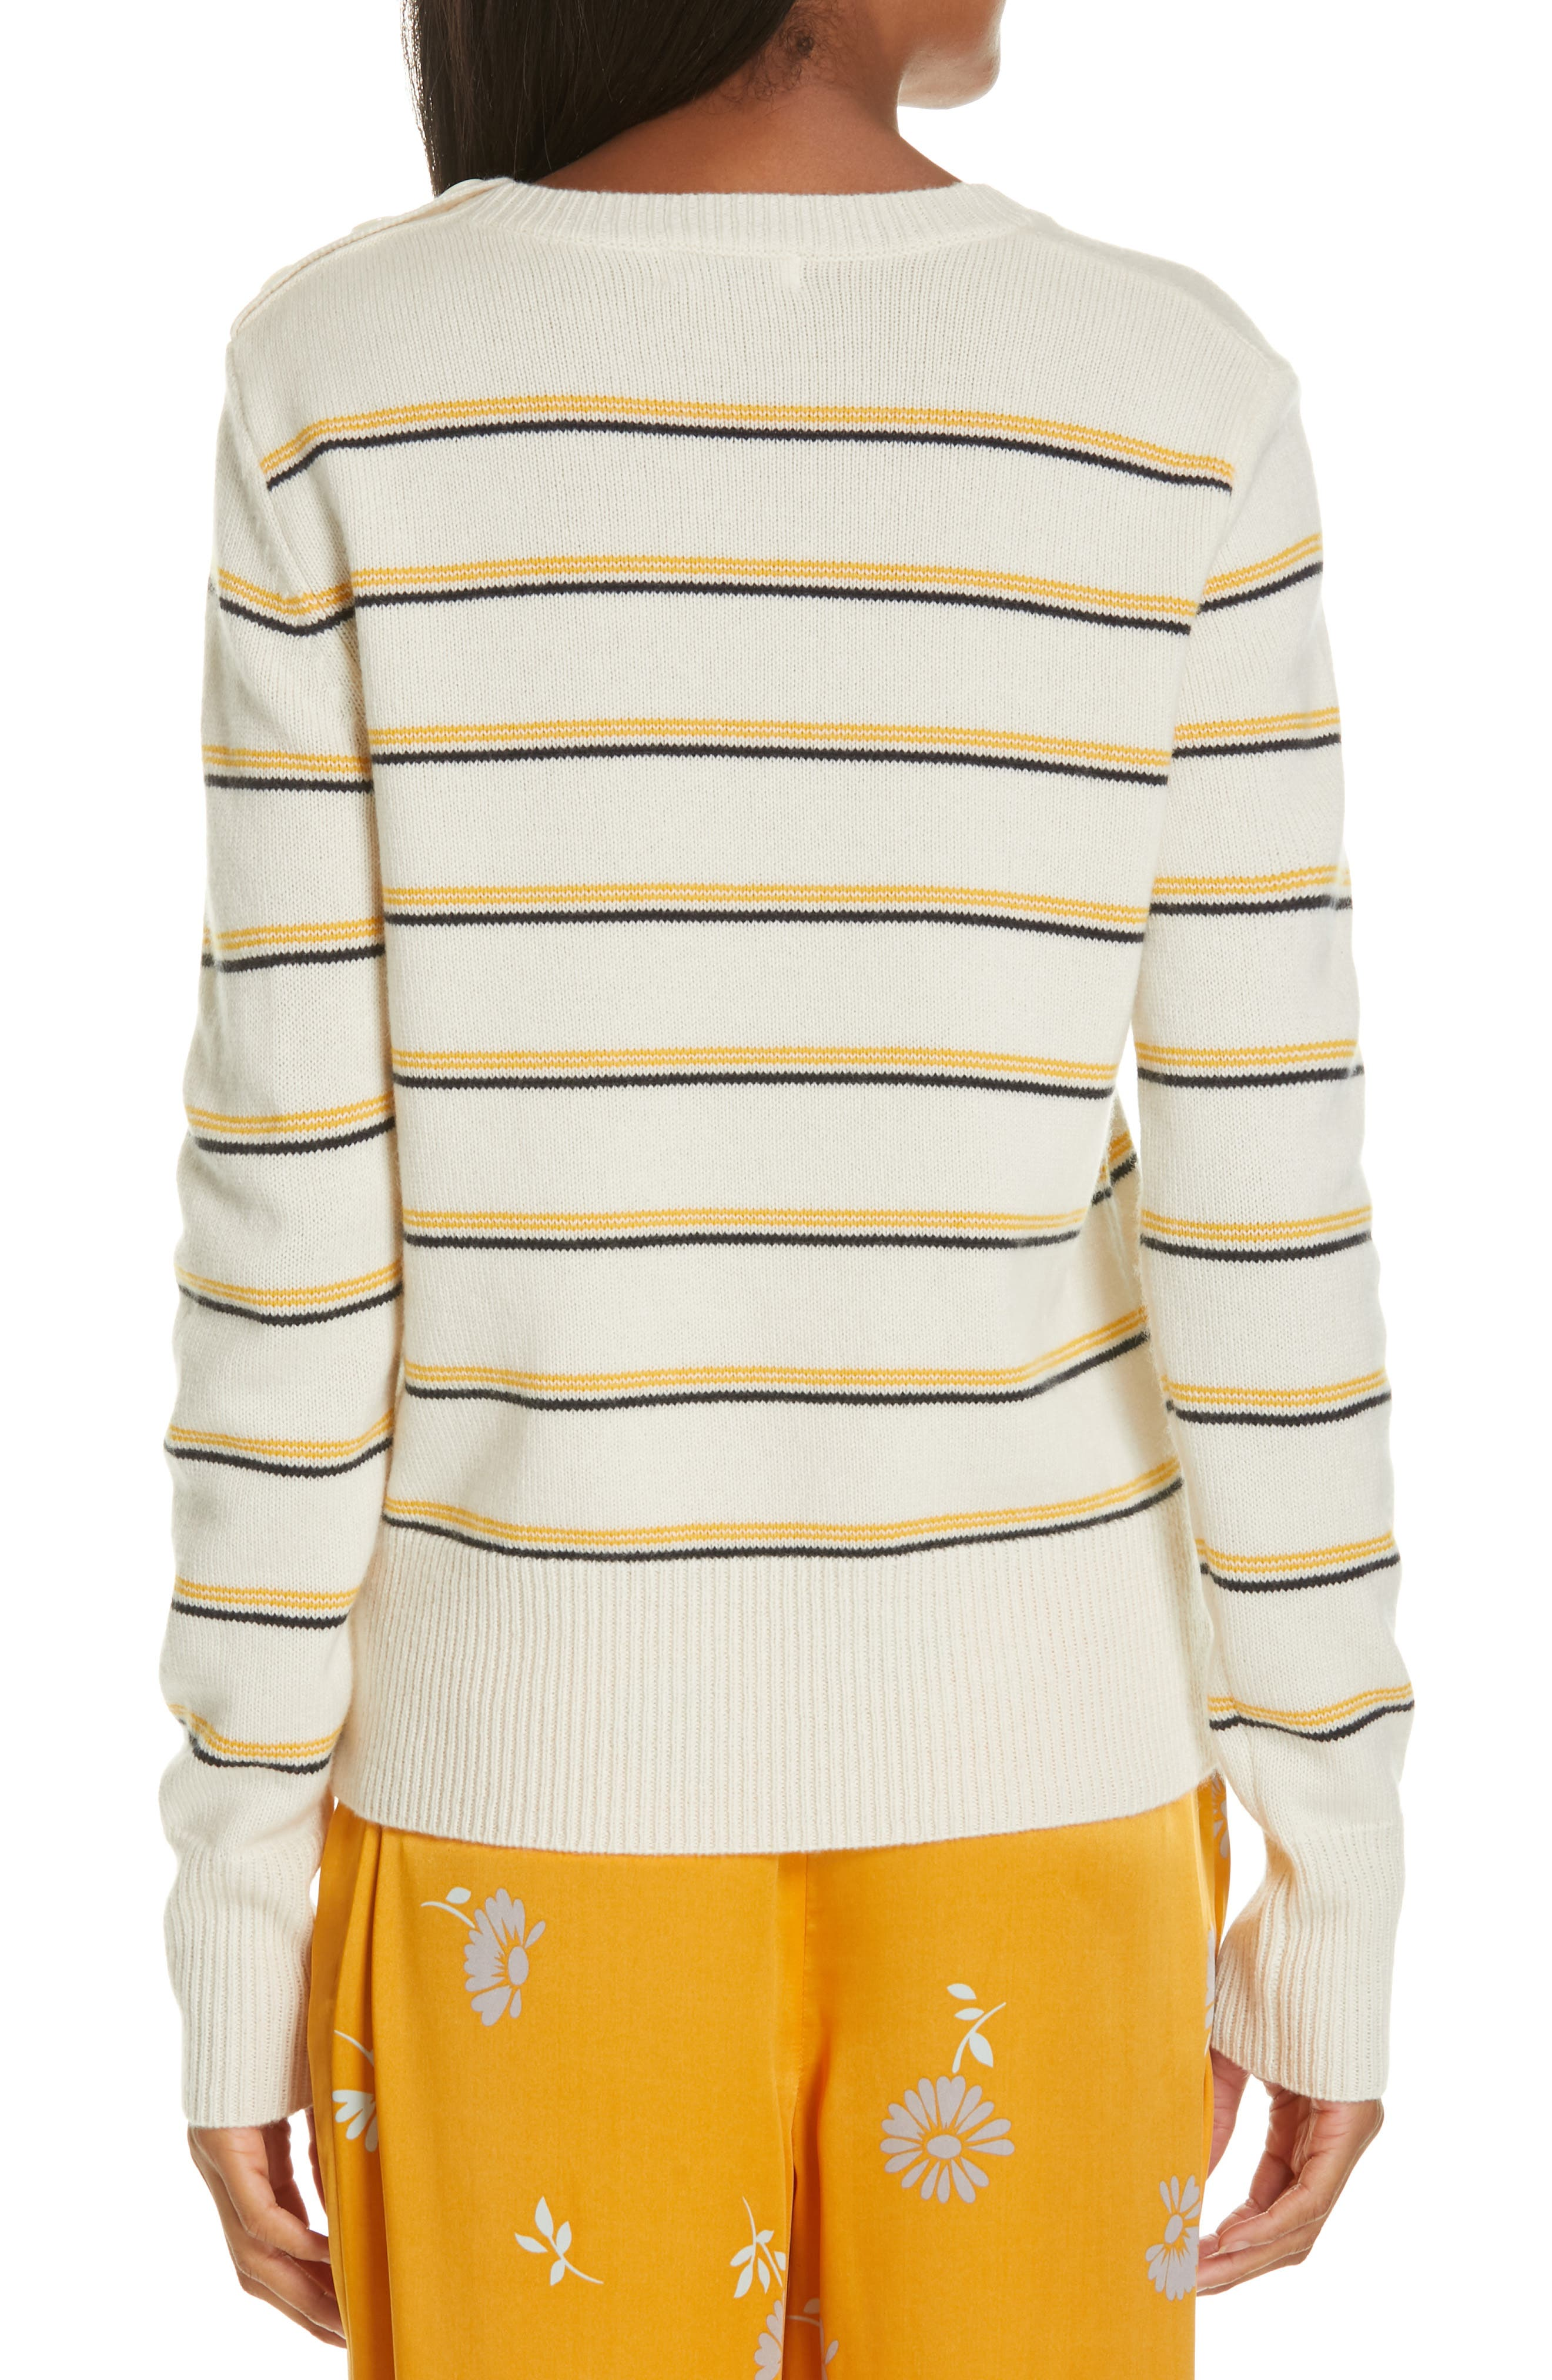 Duru Wool & Cashmere Sweater,                             Alternate thumbnail 2, color,                             NATURE WHITE MULTI